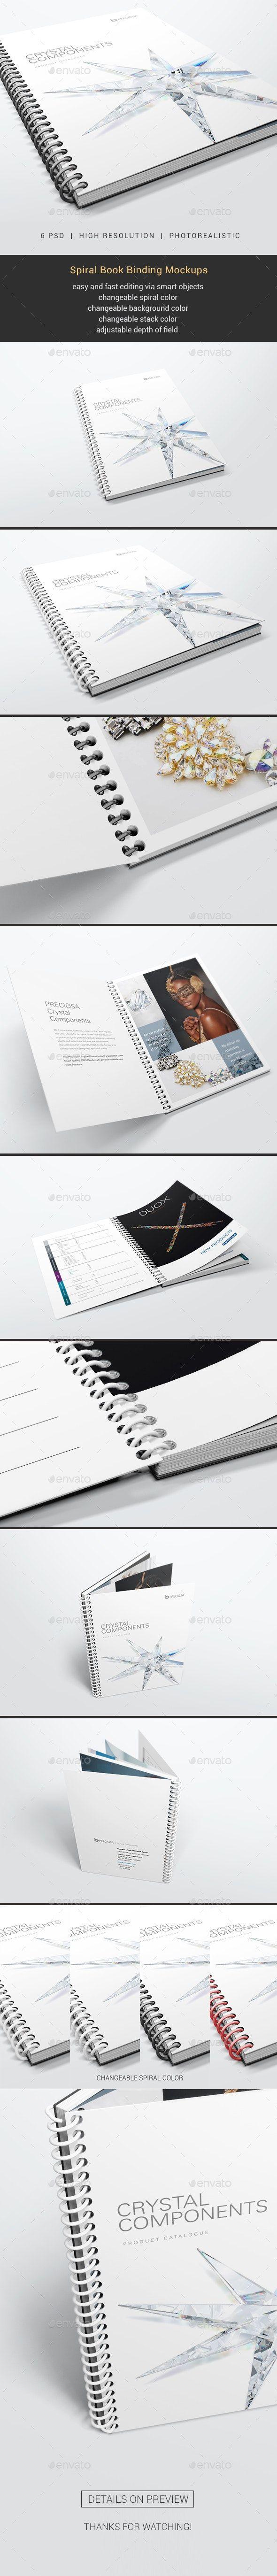 Spiral Book Binding Mockups 01 Spiral Book Binding Book Binding Print Mockup